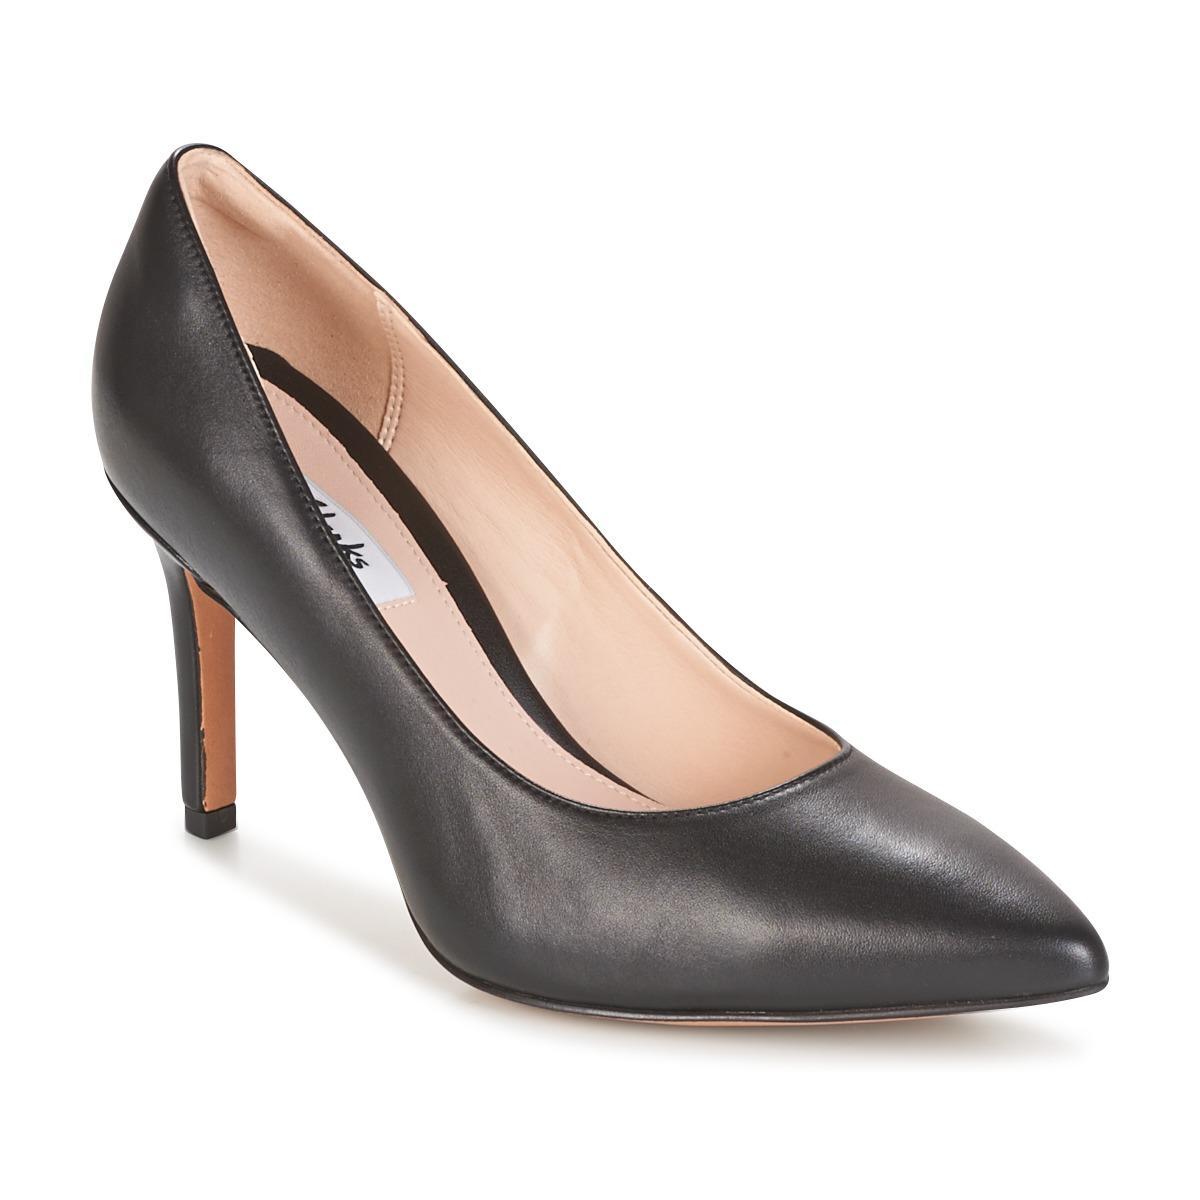 46ef450e97d4 Clarks Dinah Keer Court Shoes in Black - Lyst